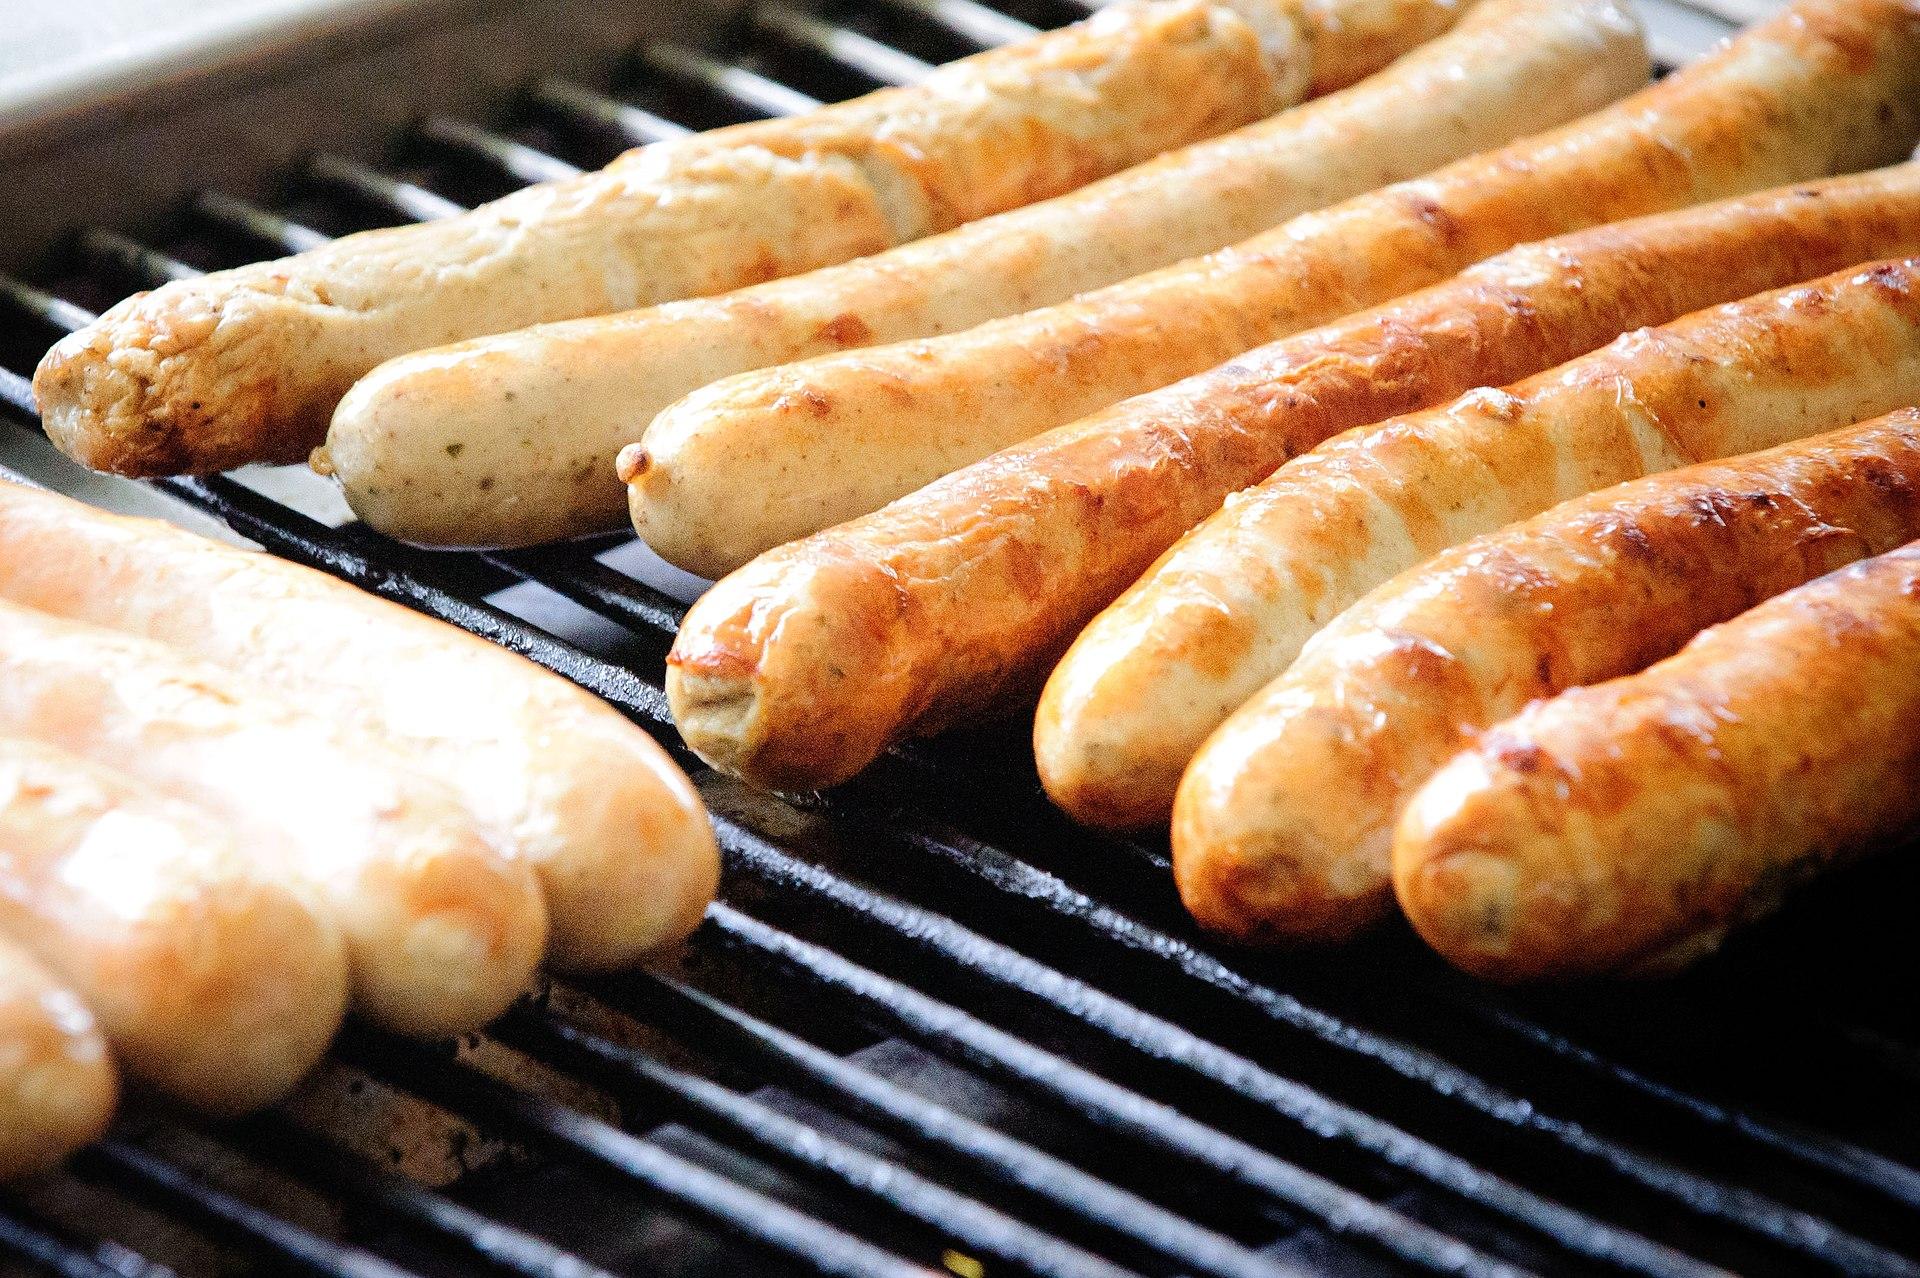 Bratwurst Hot Dog